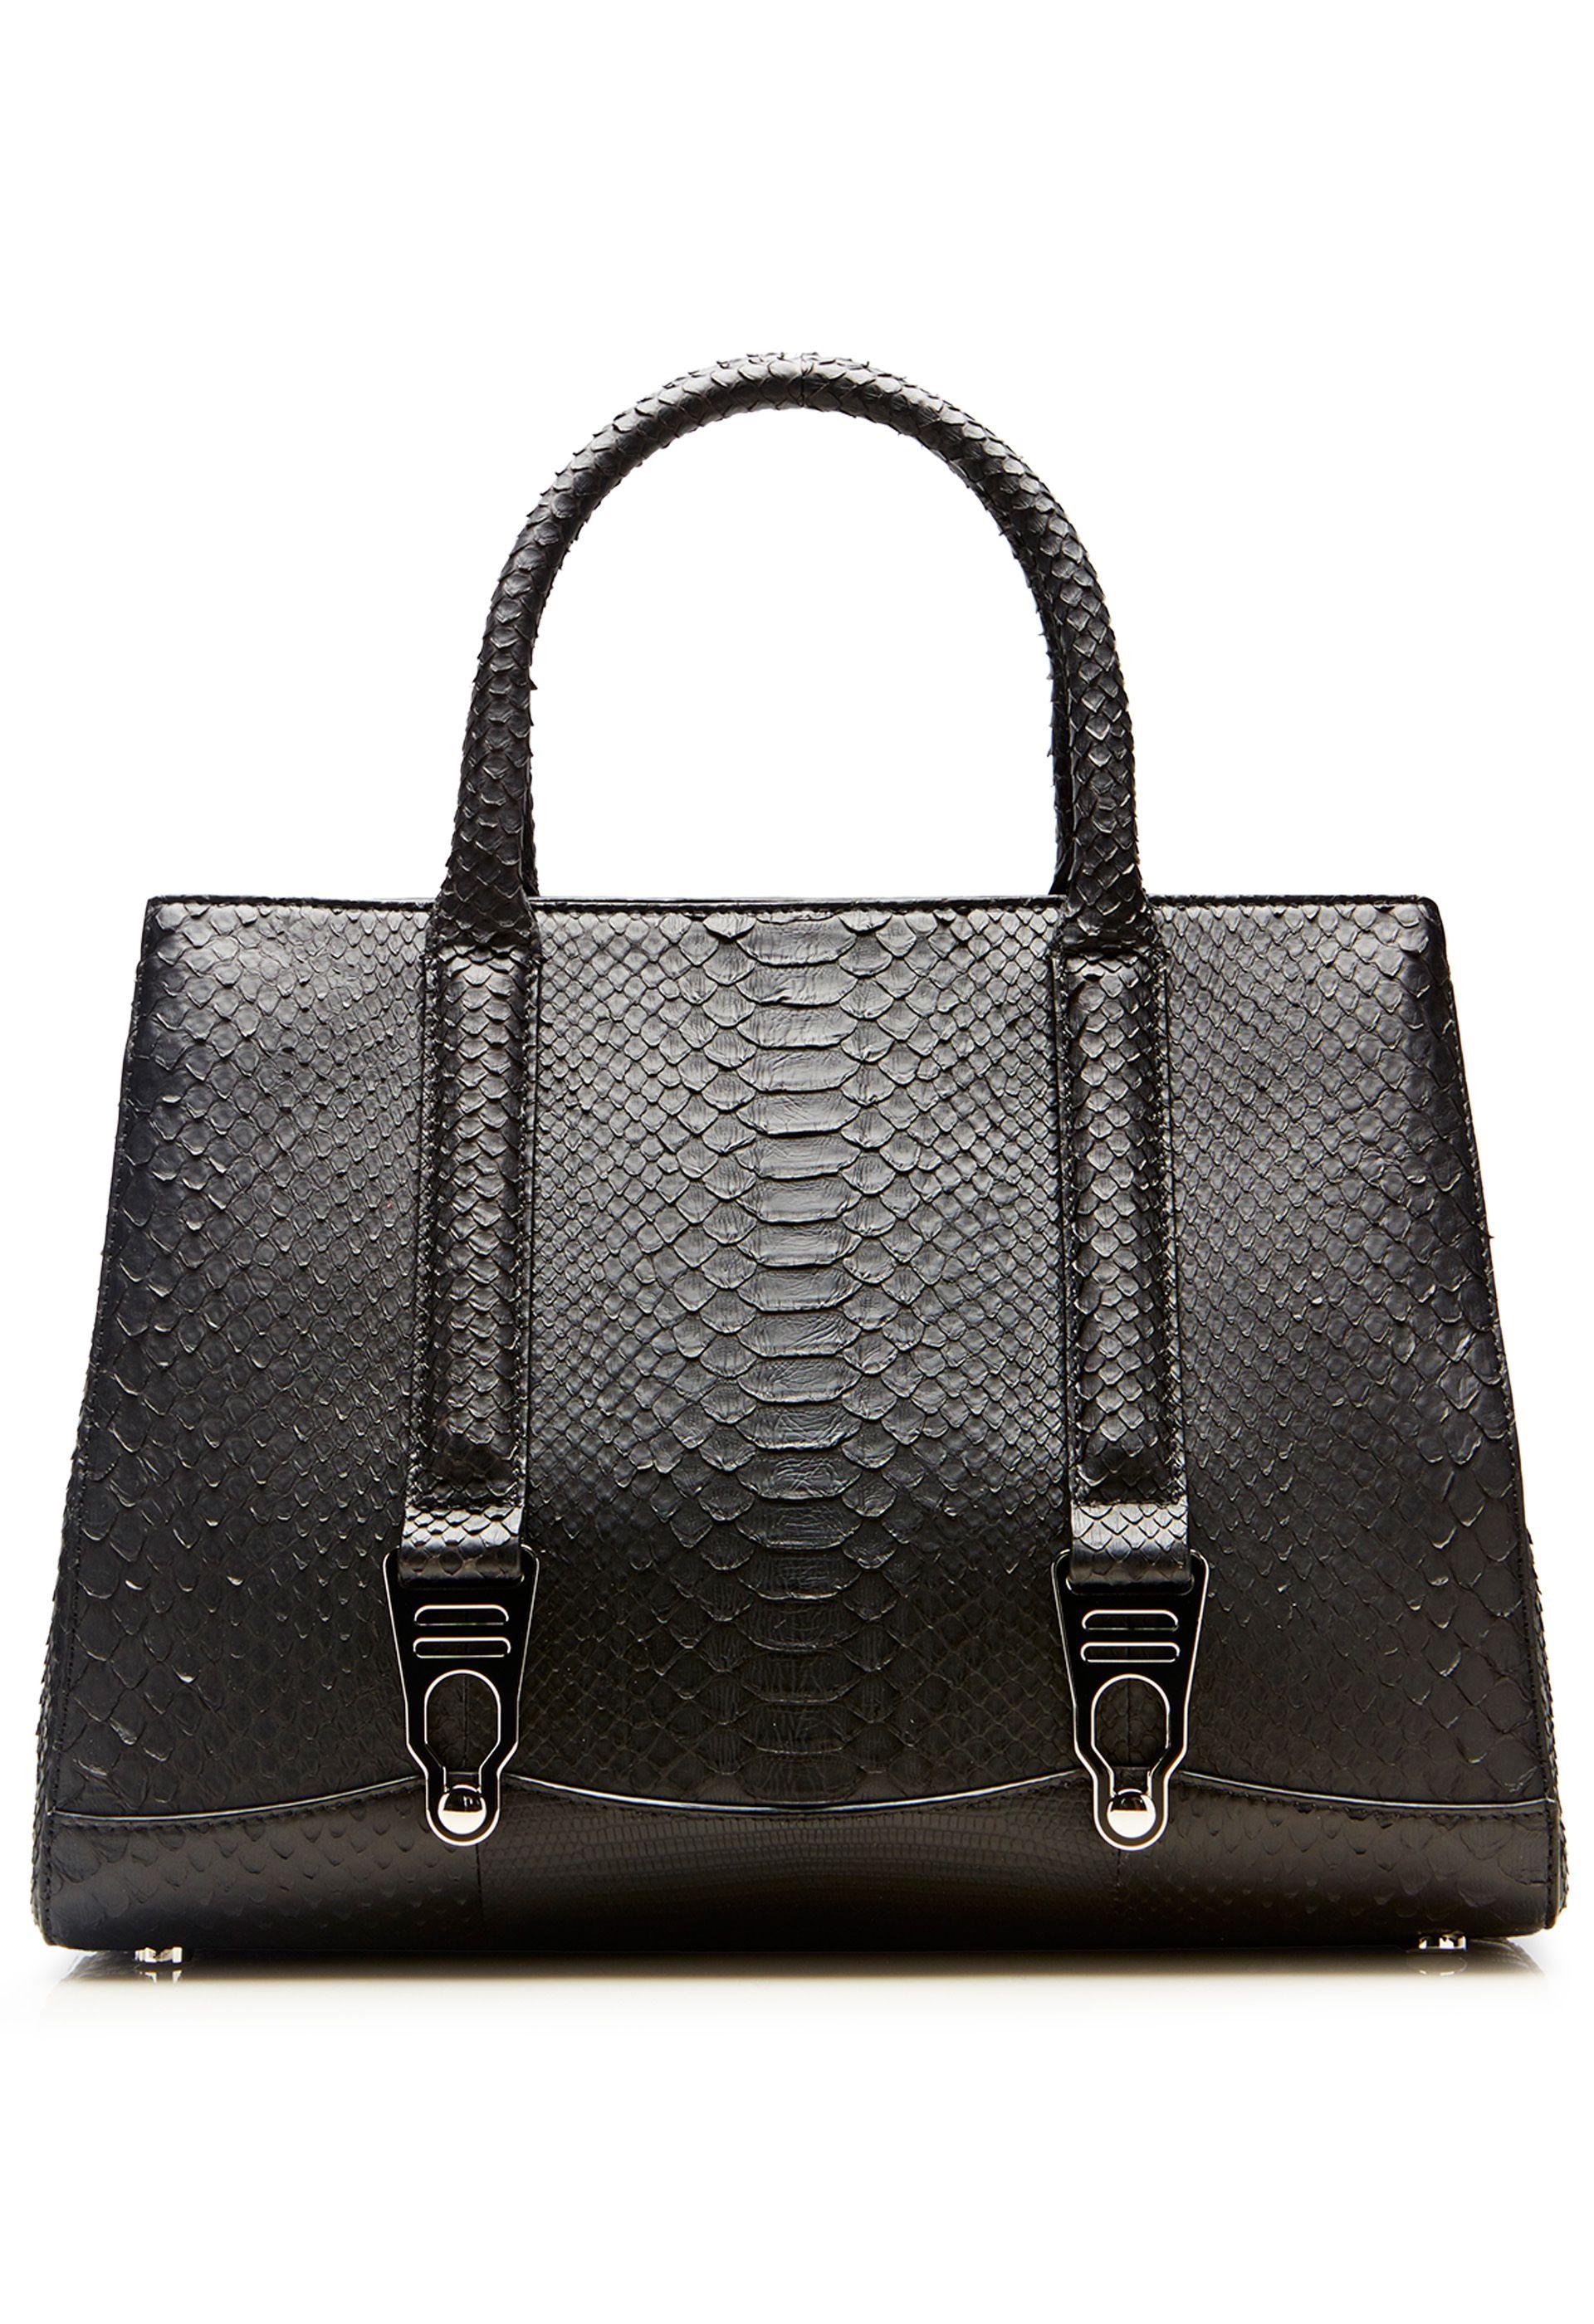 La Perla Bags Rubberised Python 1954 Bag Small